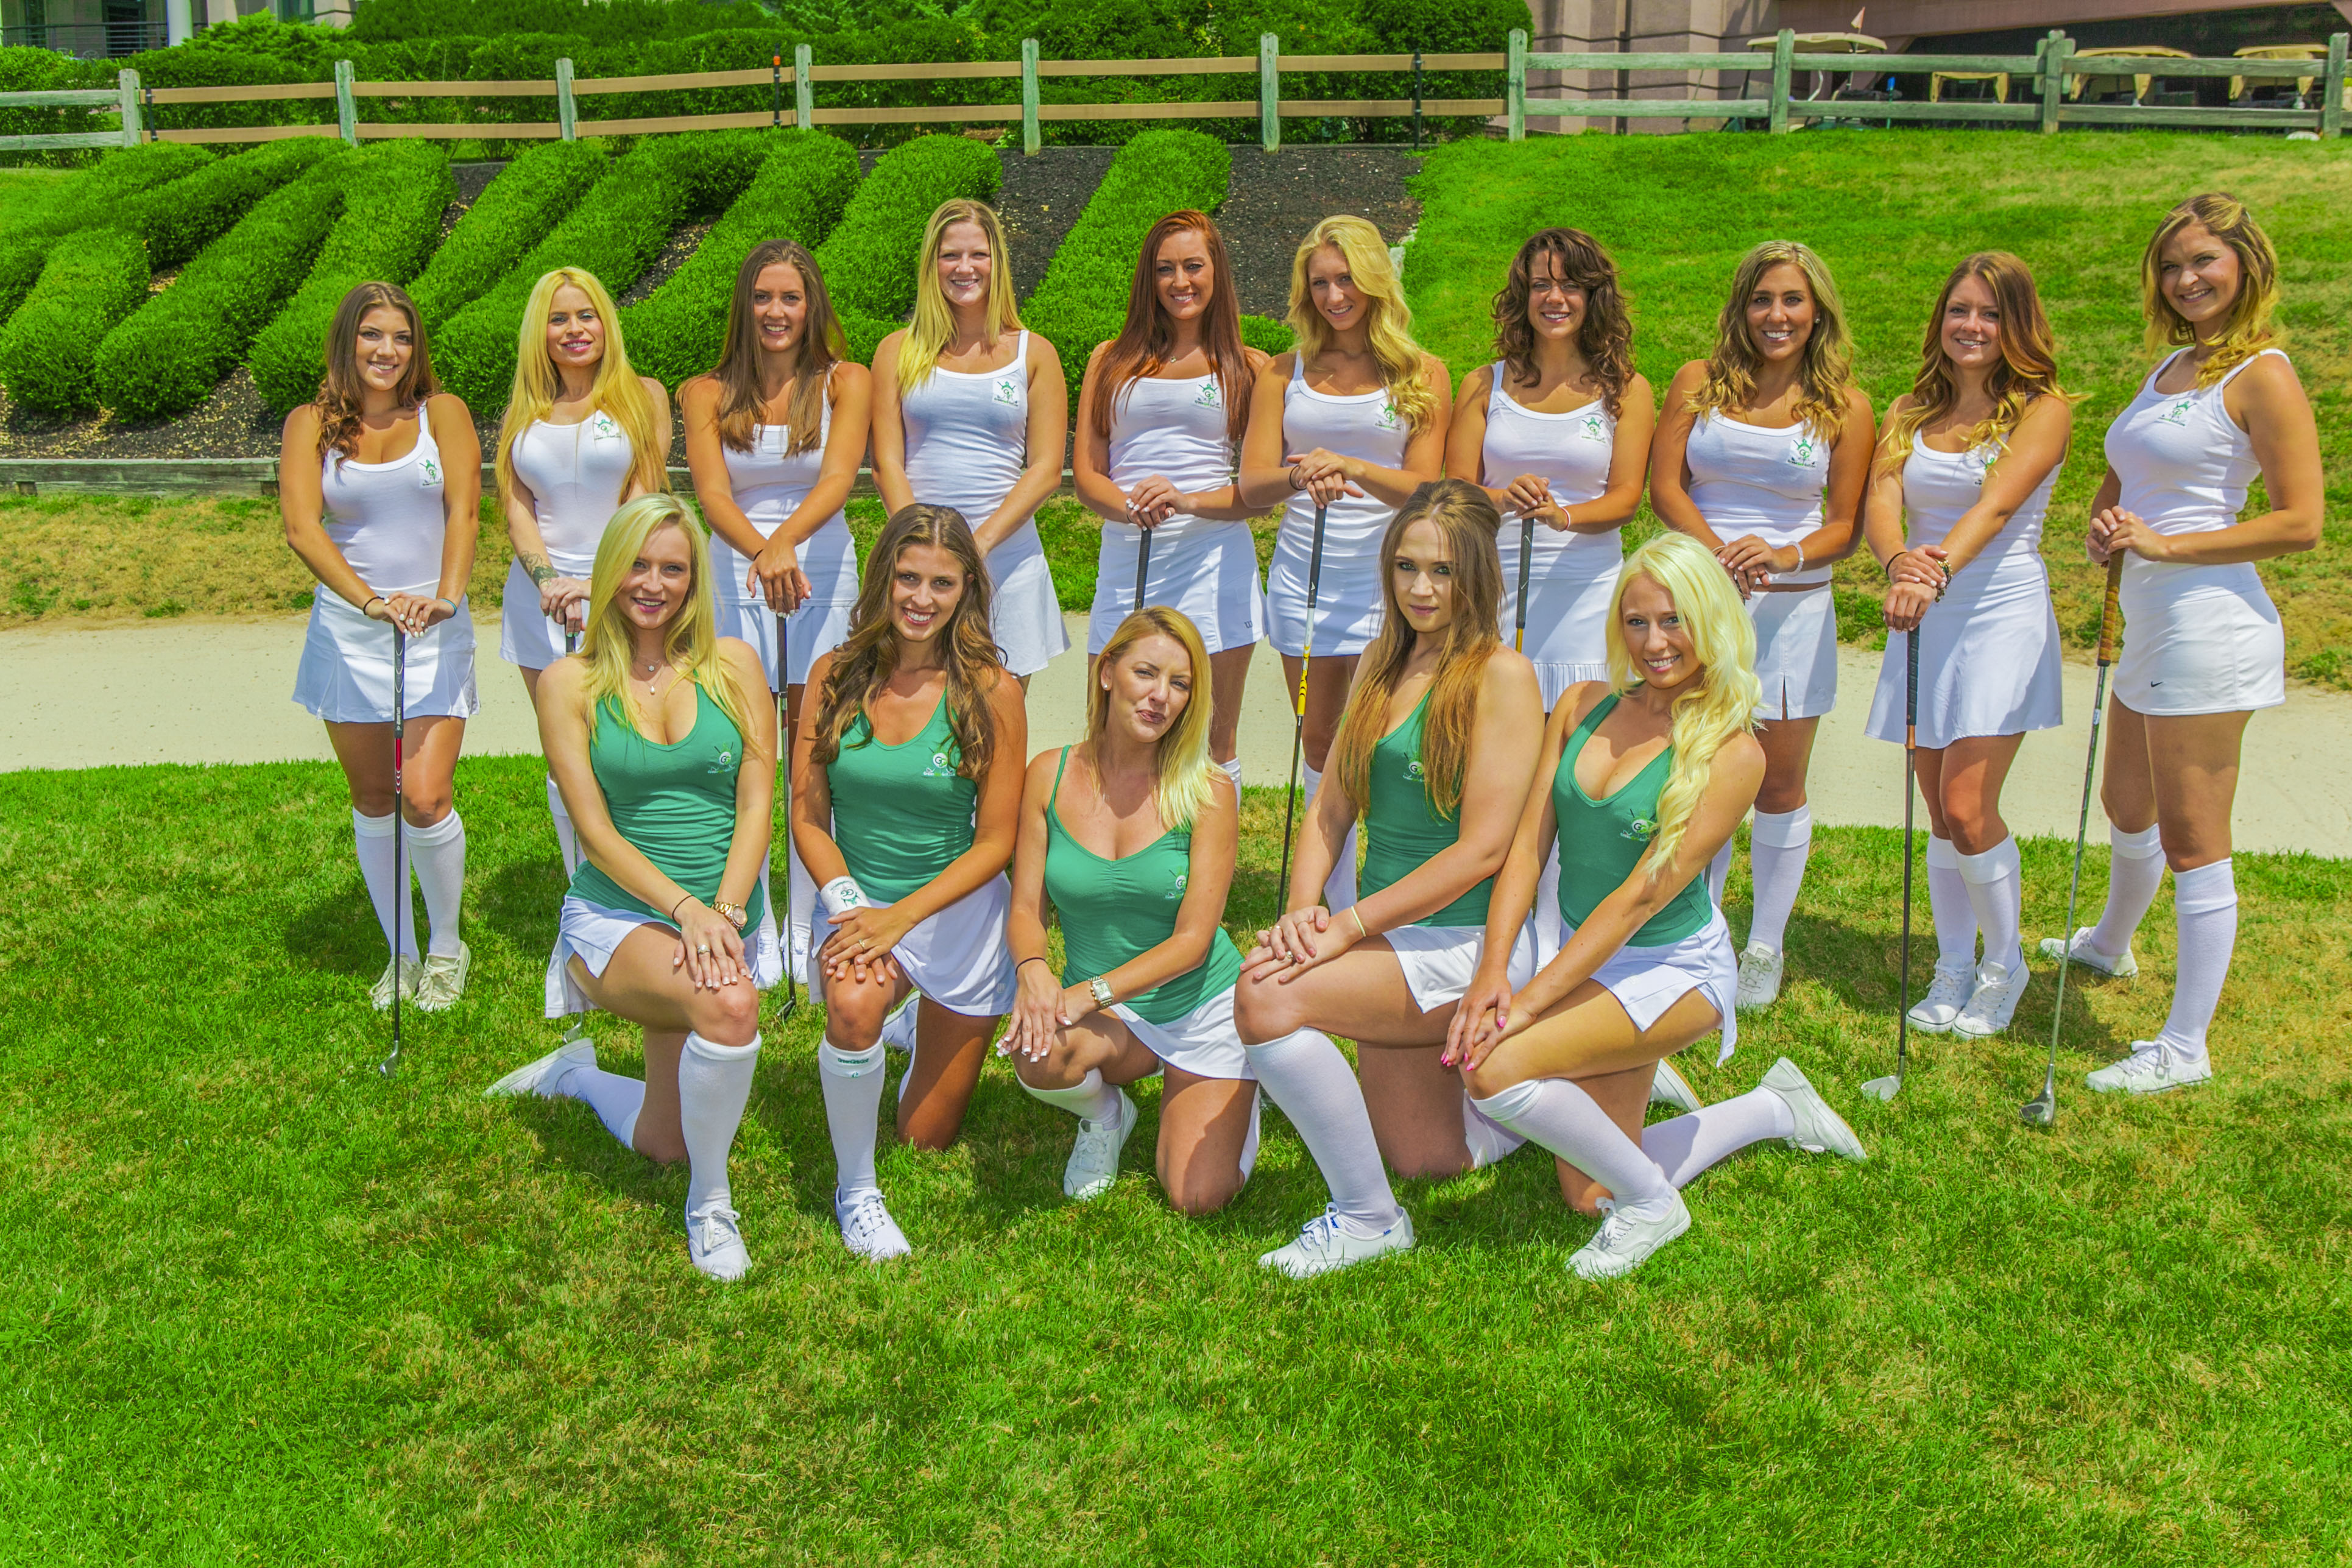 Green Girls Golf – The ultimate white glove caddie